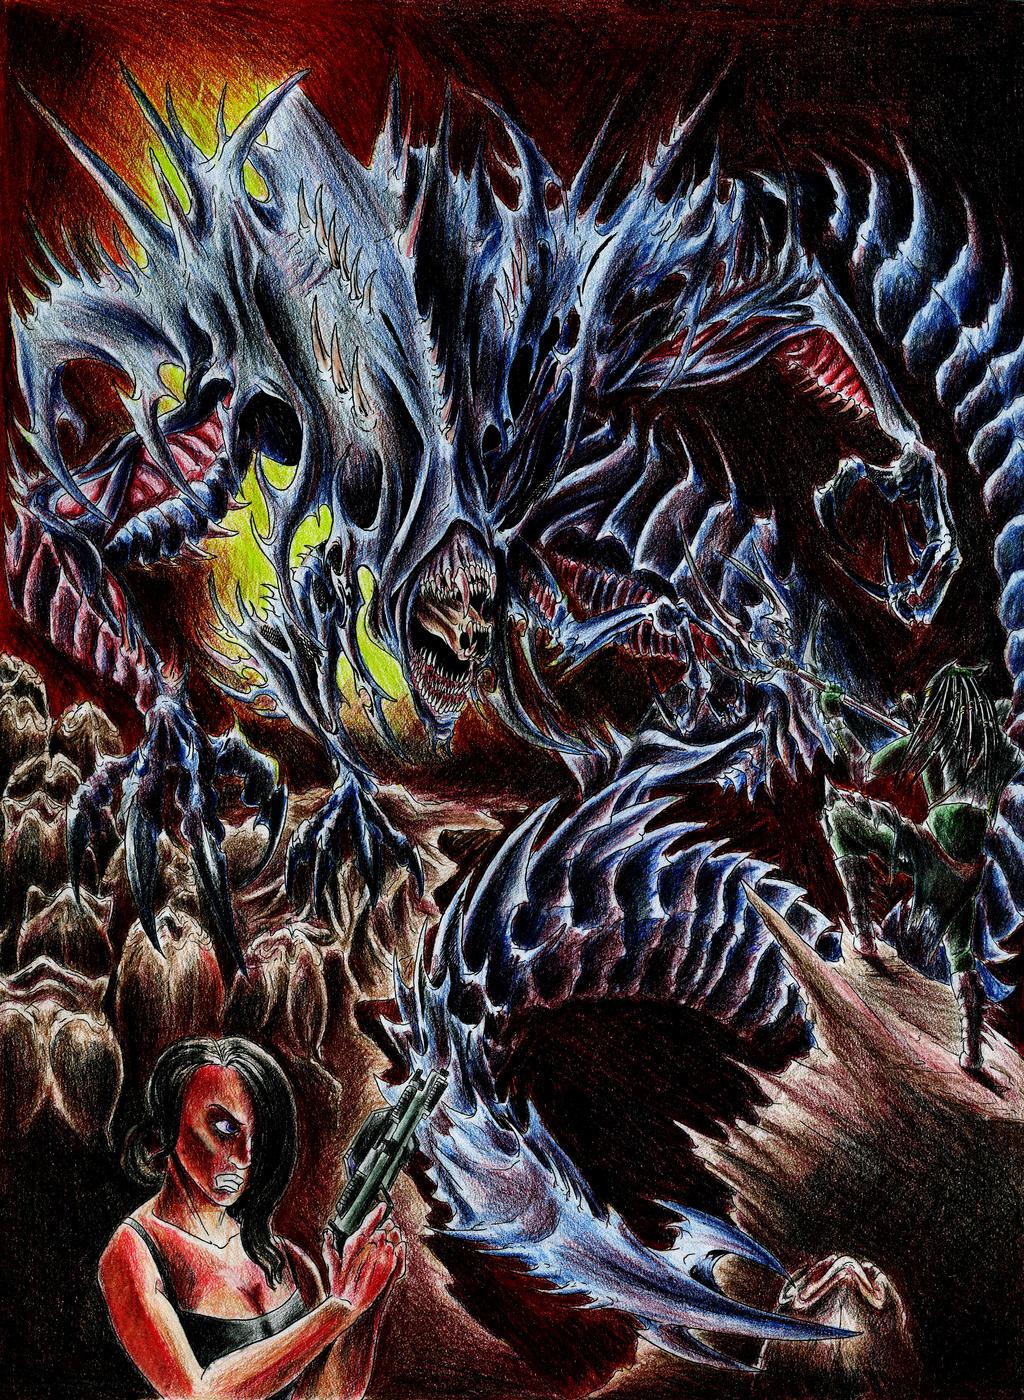 Awakening the Alien King by WretchedSpawn2012 on DeviantArt